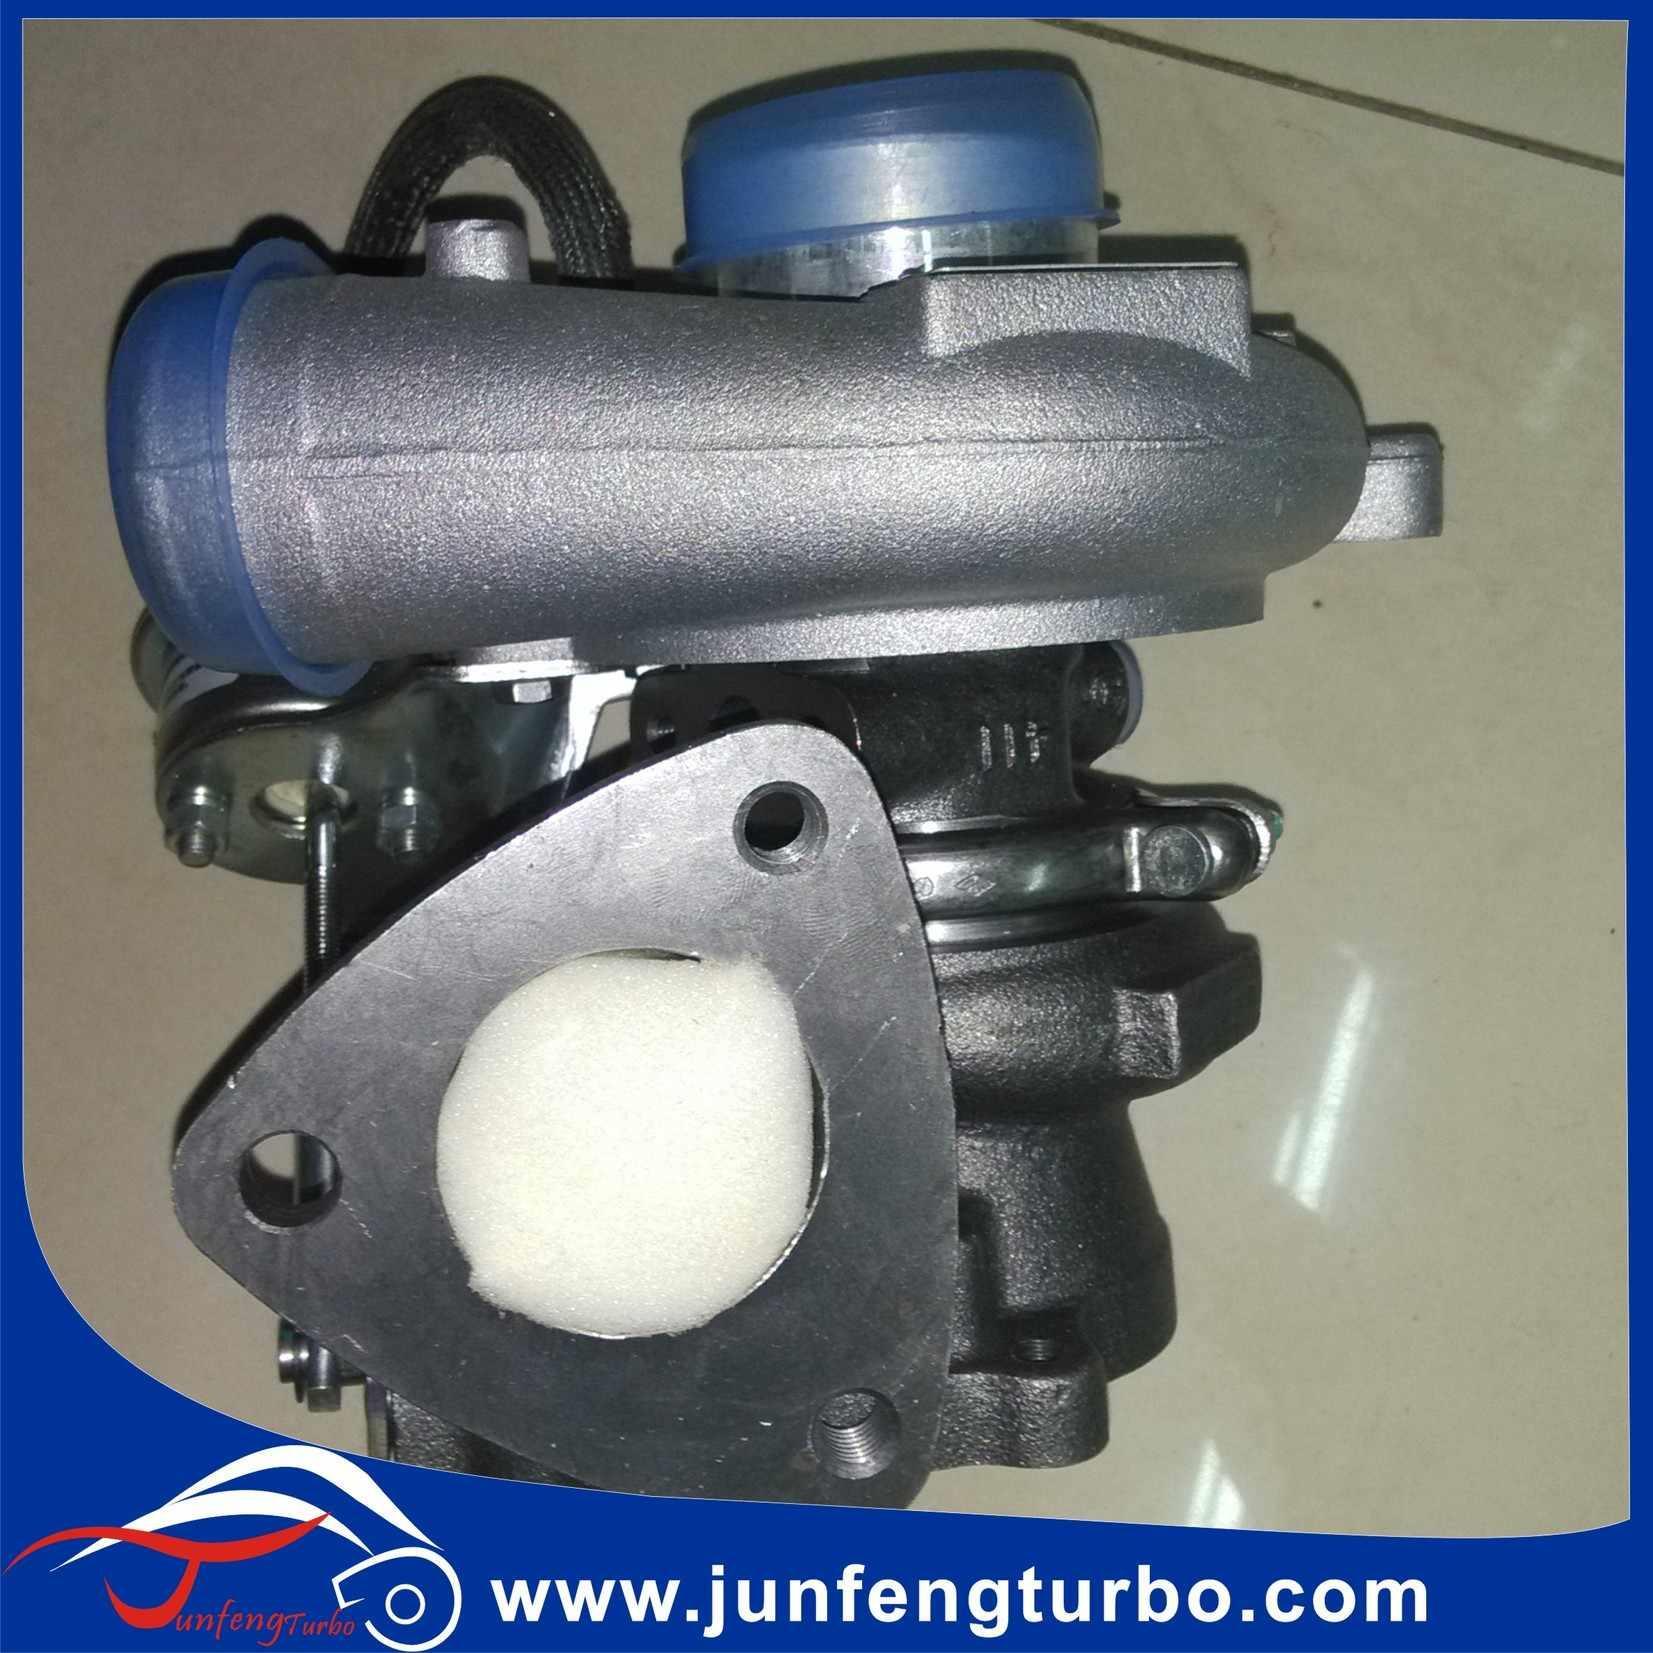 TF035HM turbo 49135-06810 1118100-E09-B1 turbocharger 1118100E09B1 Great Wall Haval